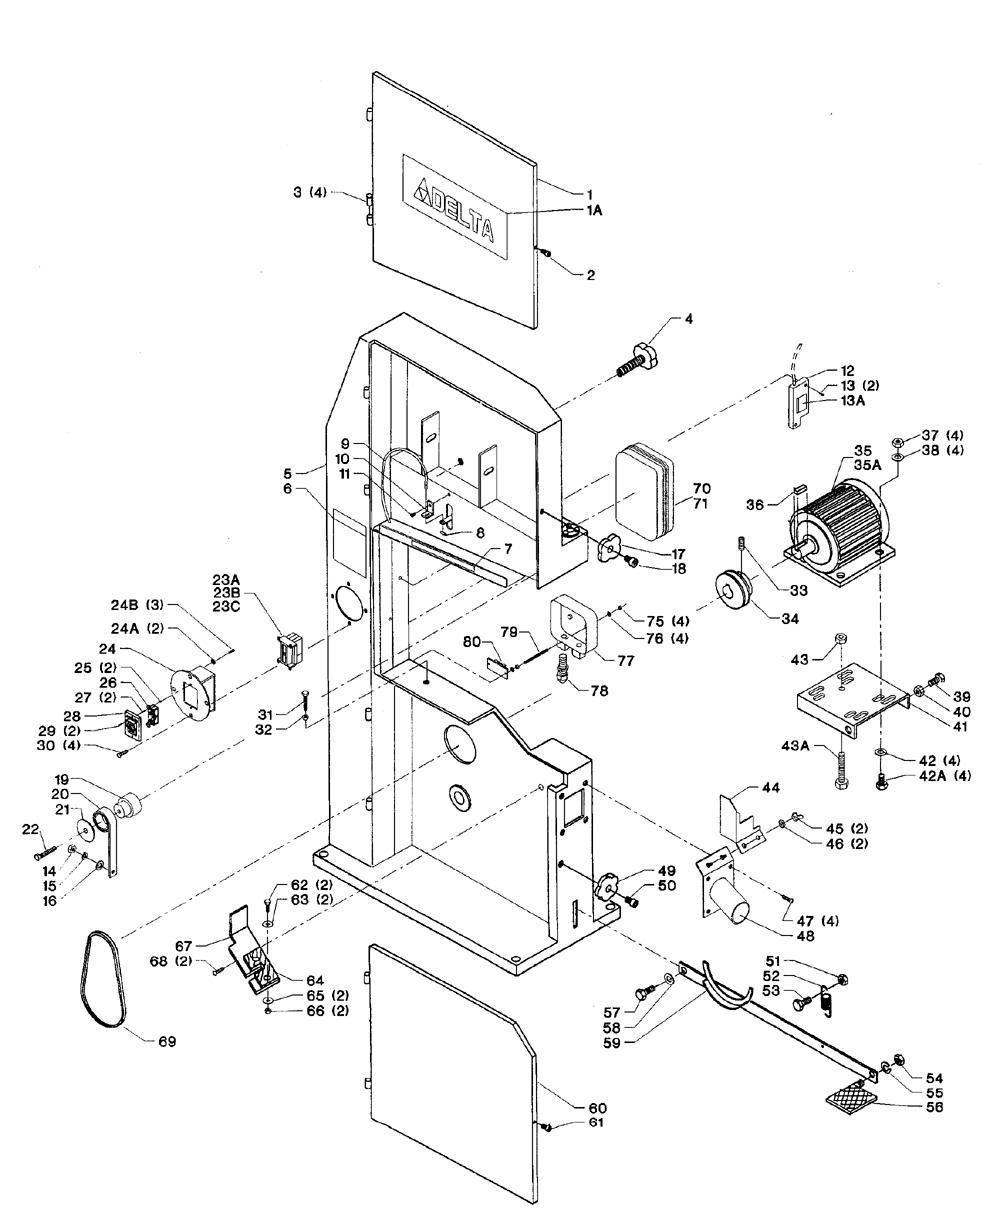 wiring diagram for deltum radial arm saw wiring diagram database